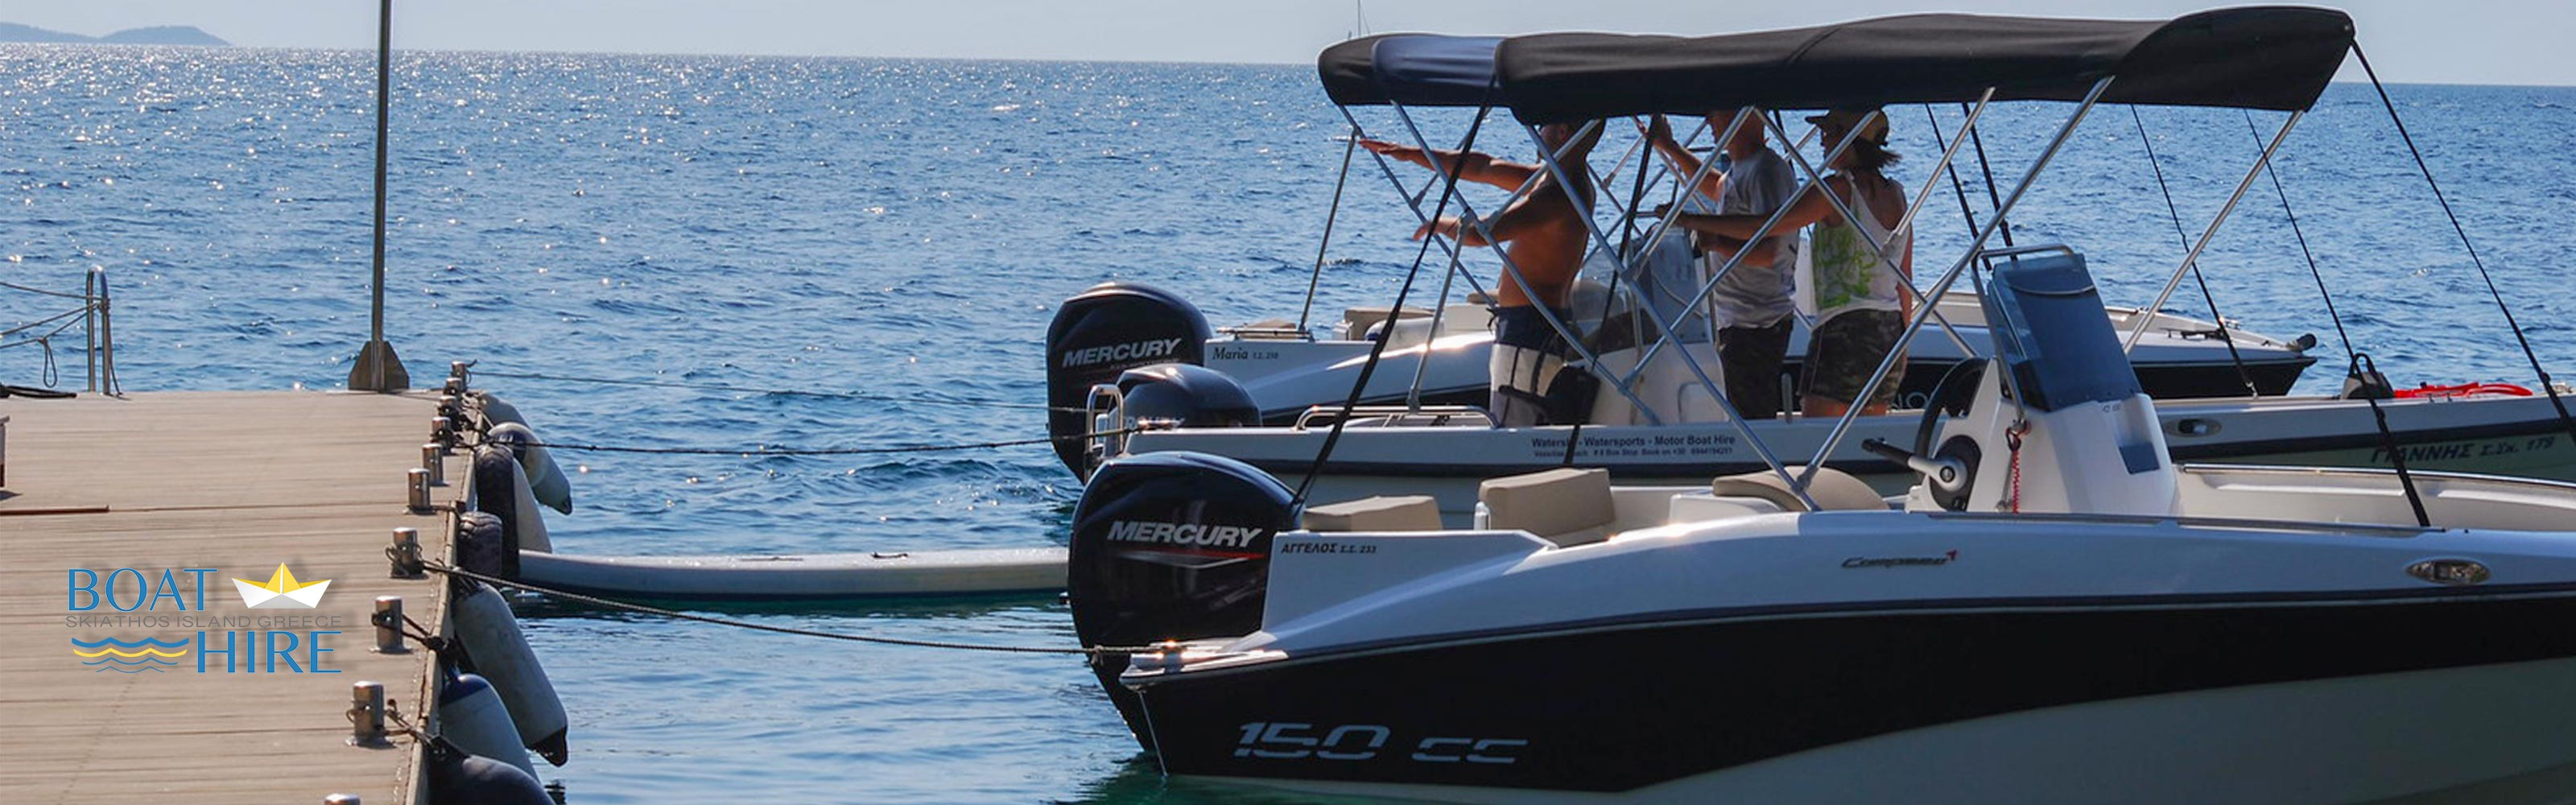 boat hire in Skiathos